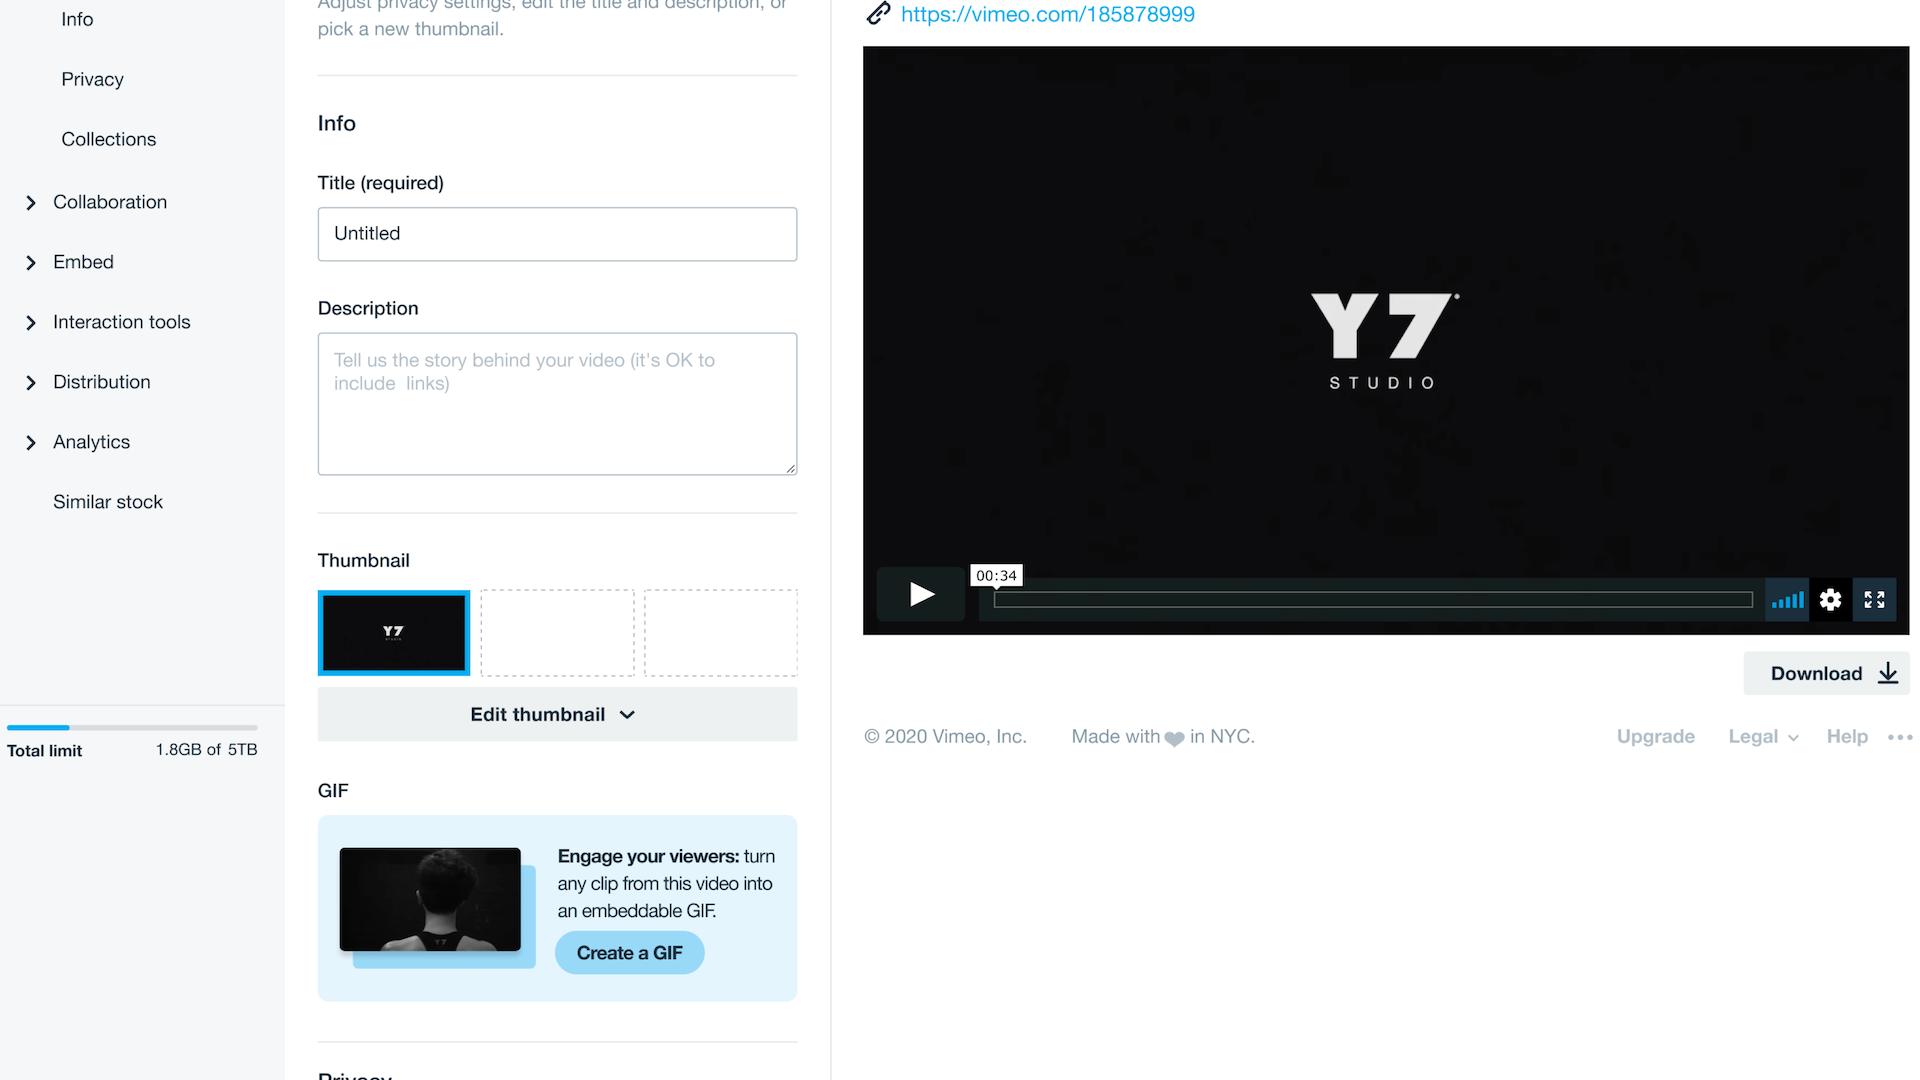 vimeo video settings interface